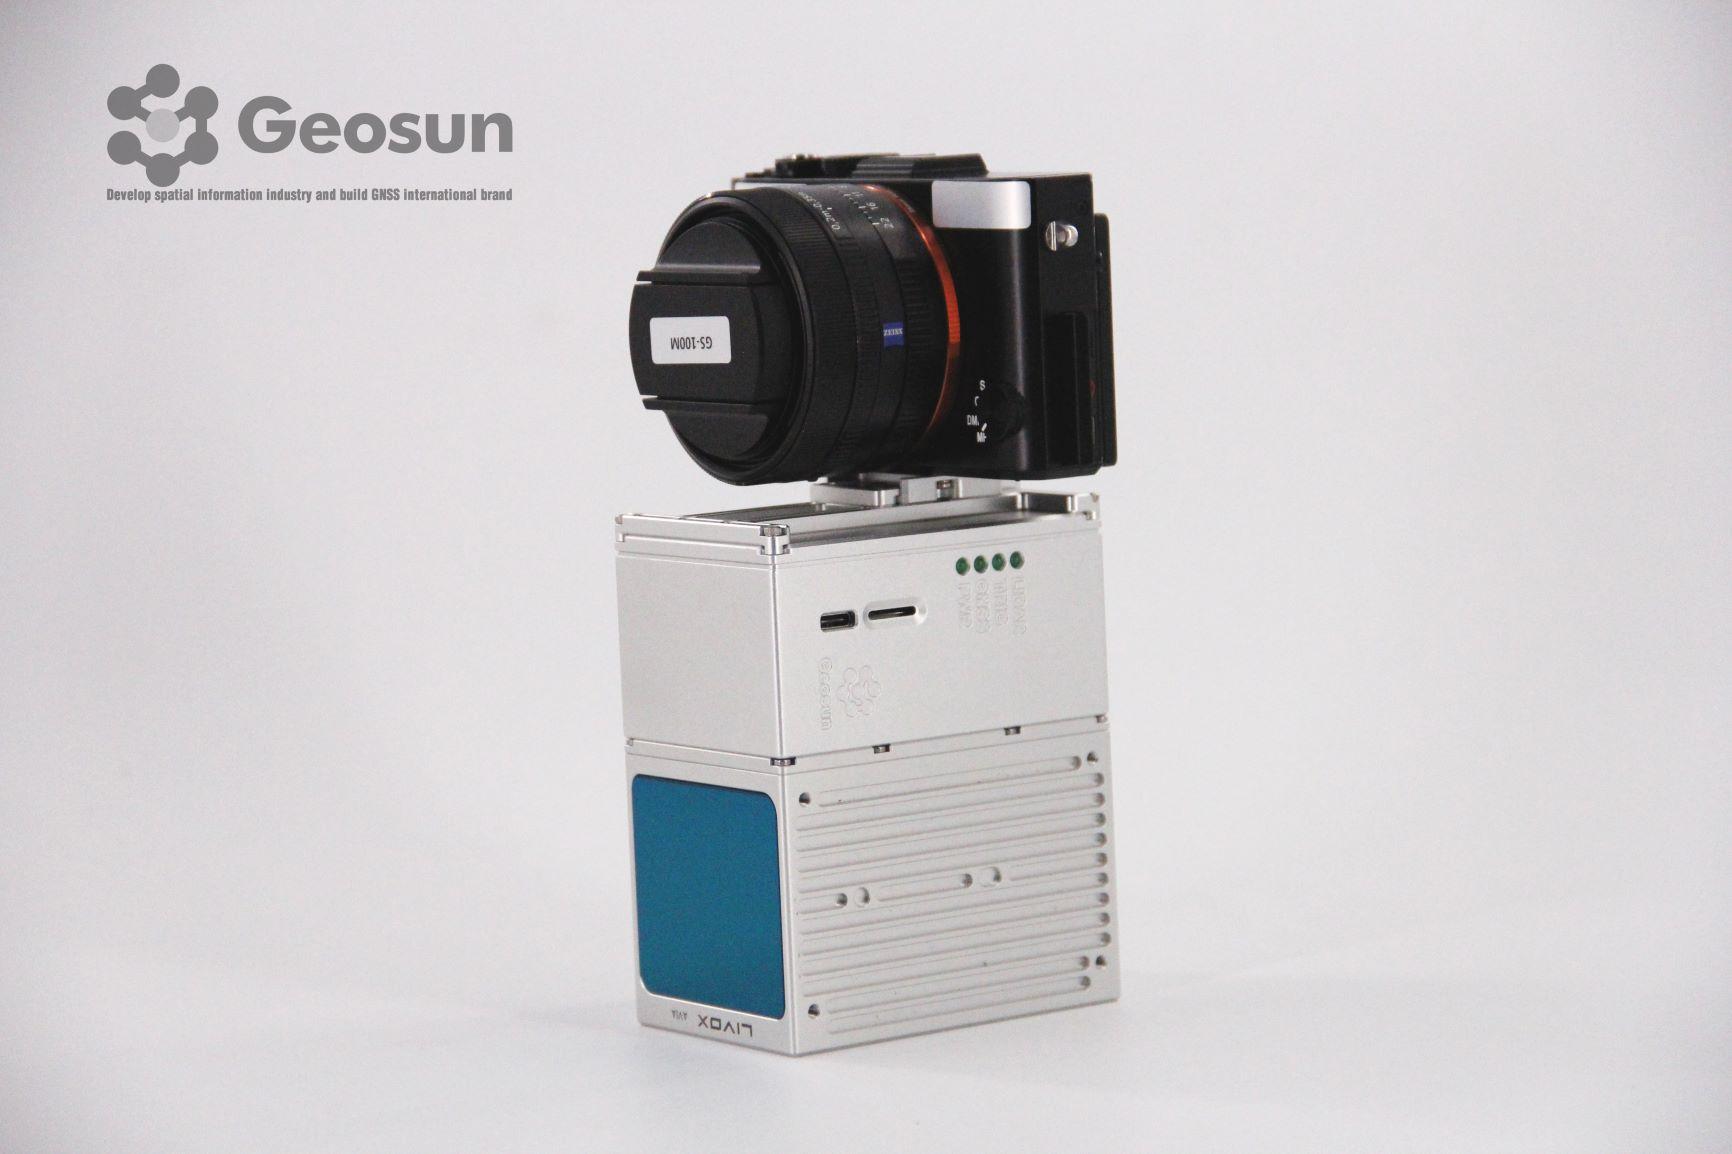 Geosun UAV LiDAR scanning systems selects ACEINNA as IMU provider